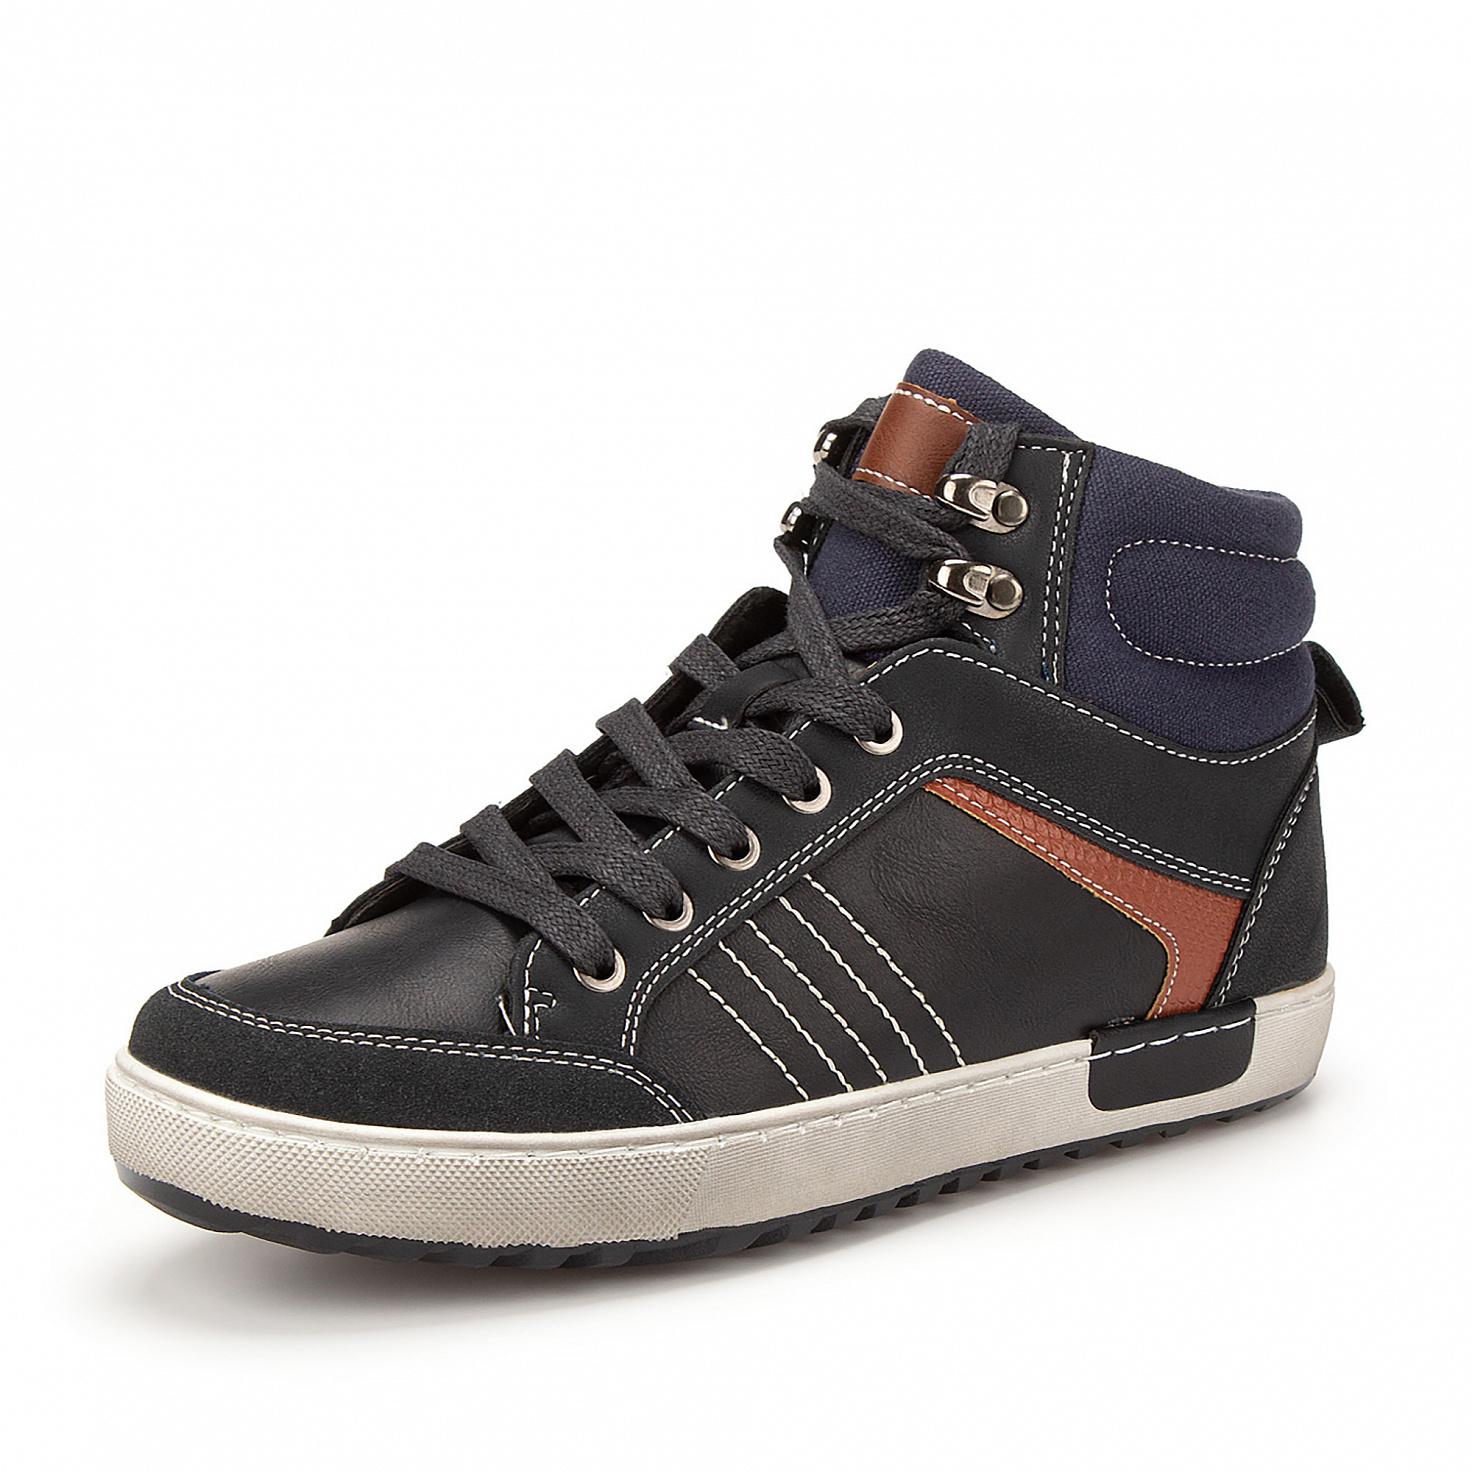 Купить 189-02BO-032SR, Ботинки для мальчиков ZENDEN, цв. синий, р-р 36,